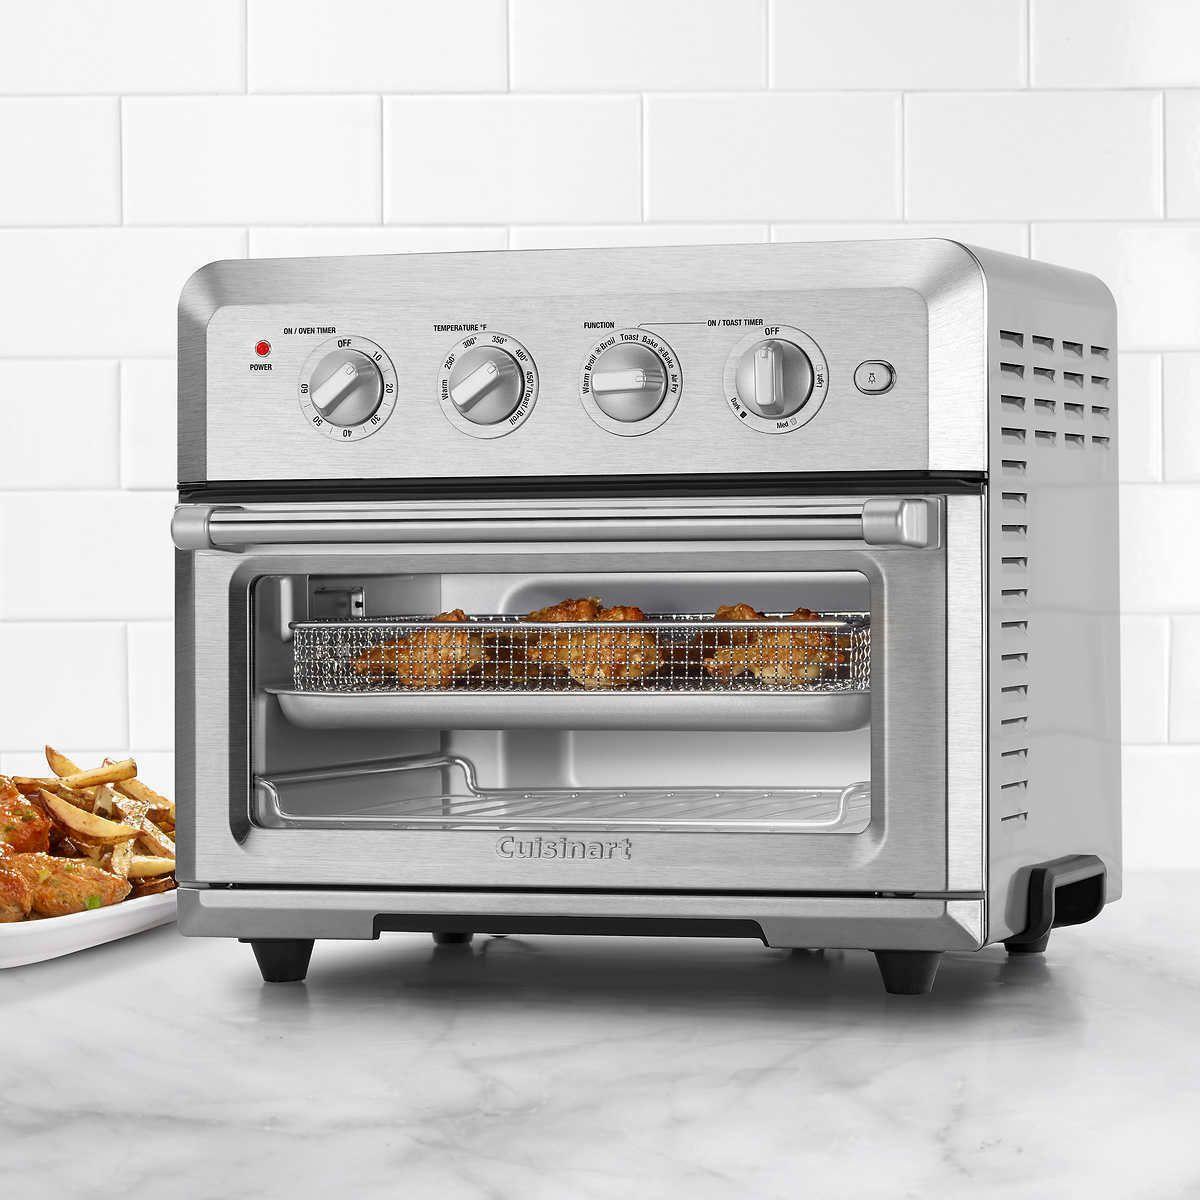 Cuisinart Air Fryer Toaster Oven Ovens Ideas Of Ovens Ovens Toaster Oven Convection Toaster Oven Toaster